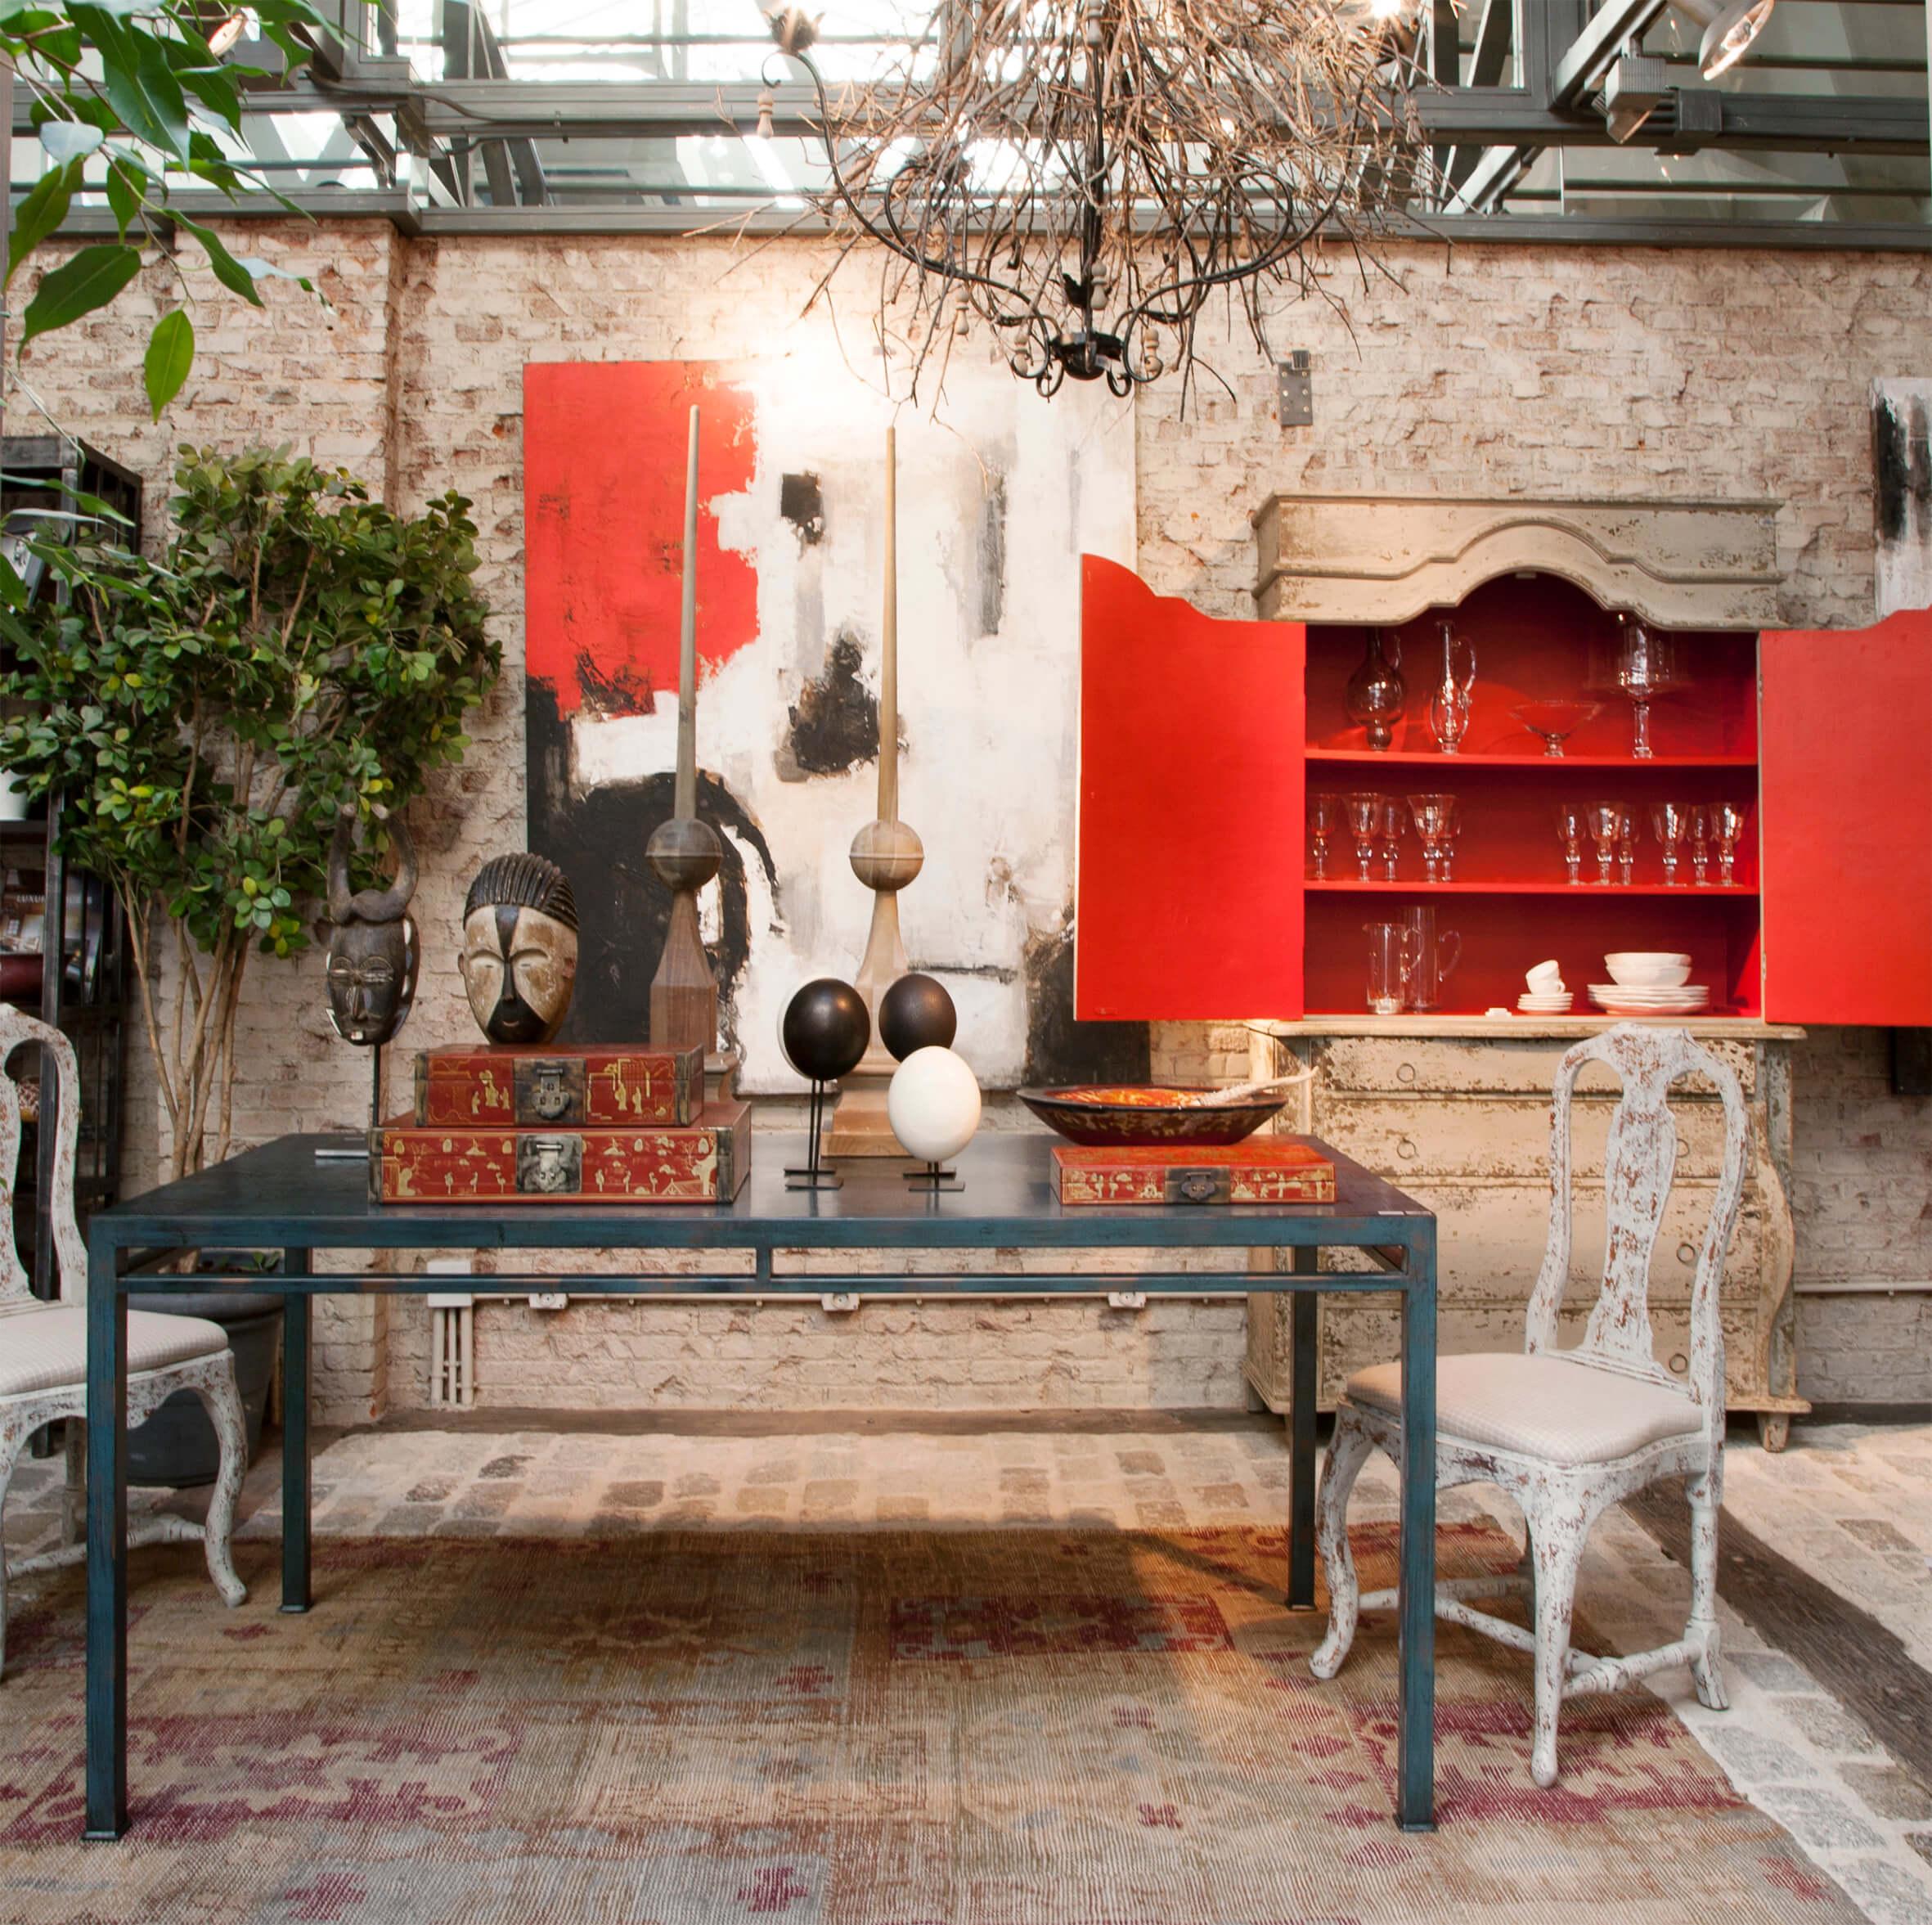 Muebles becara segunda mano obtenga ideas dise o de - Segunda mano pamplona muebles ...